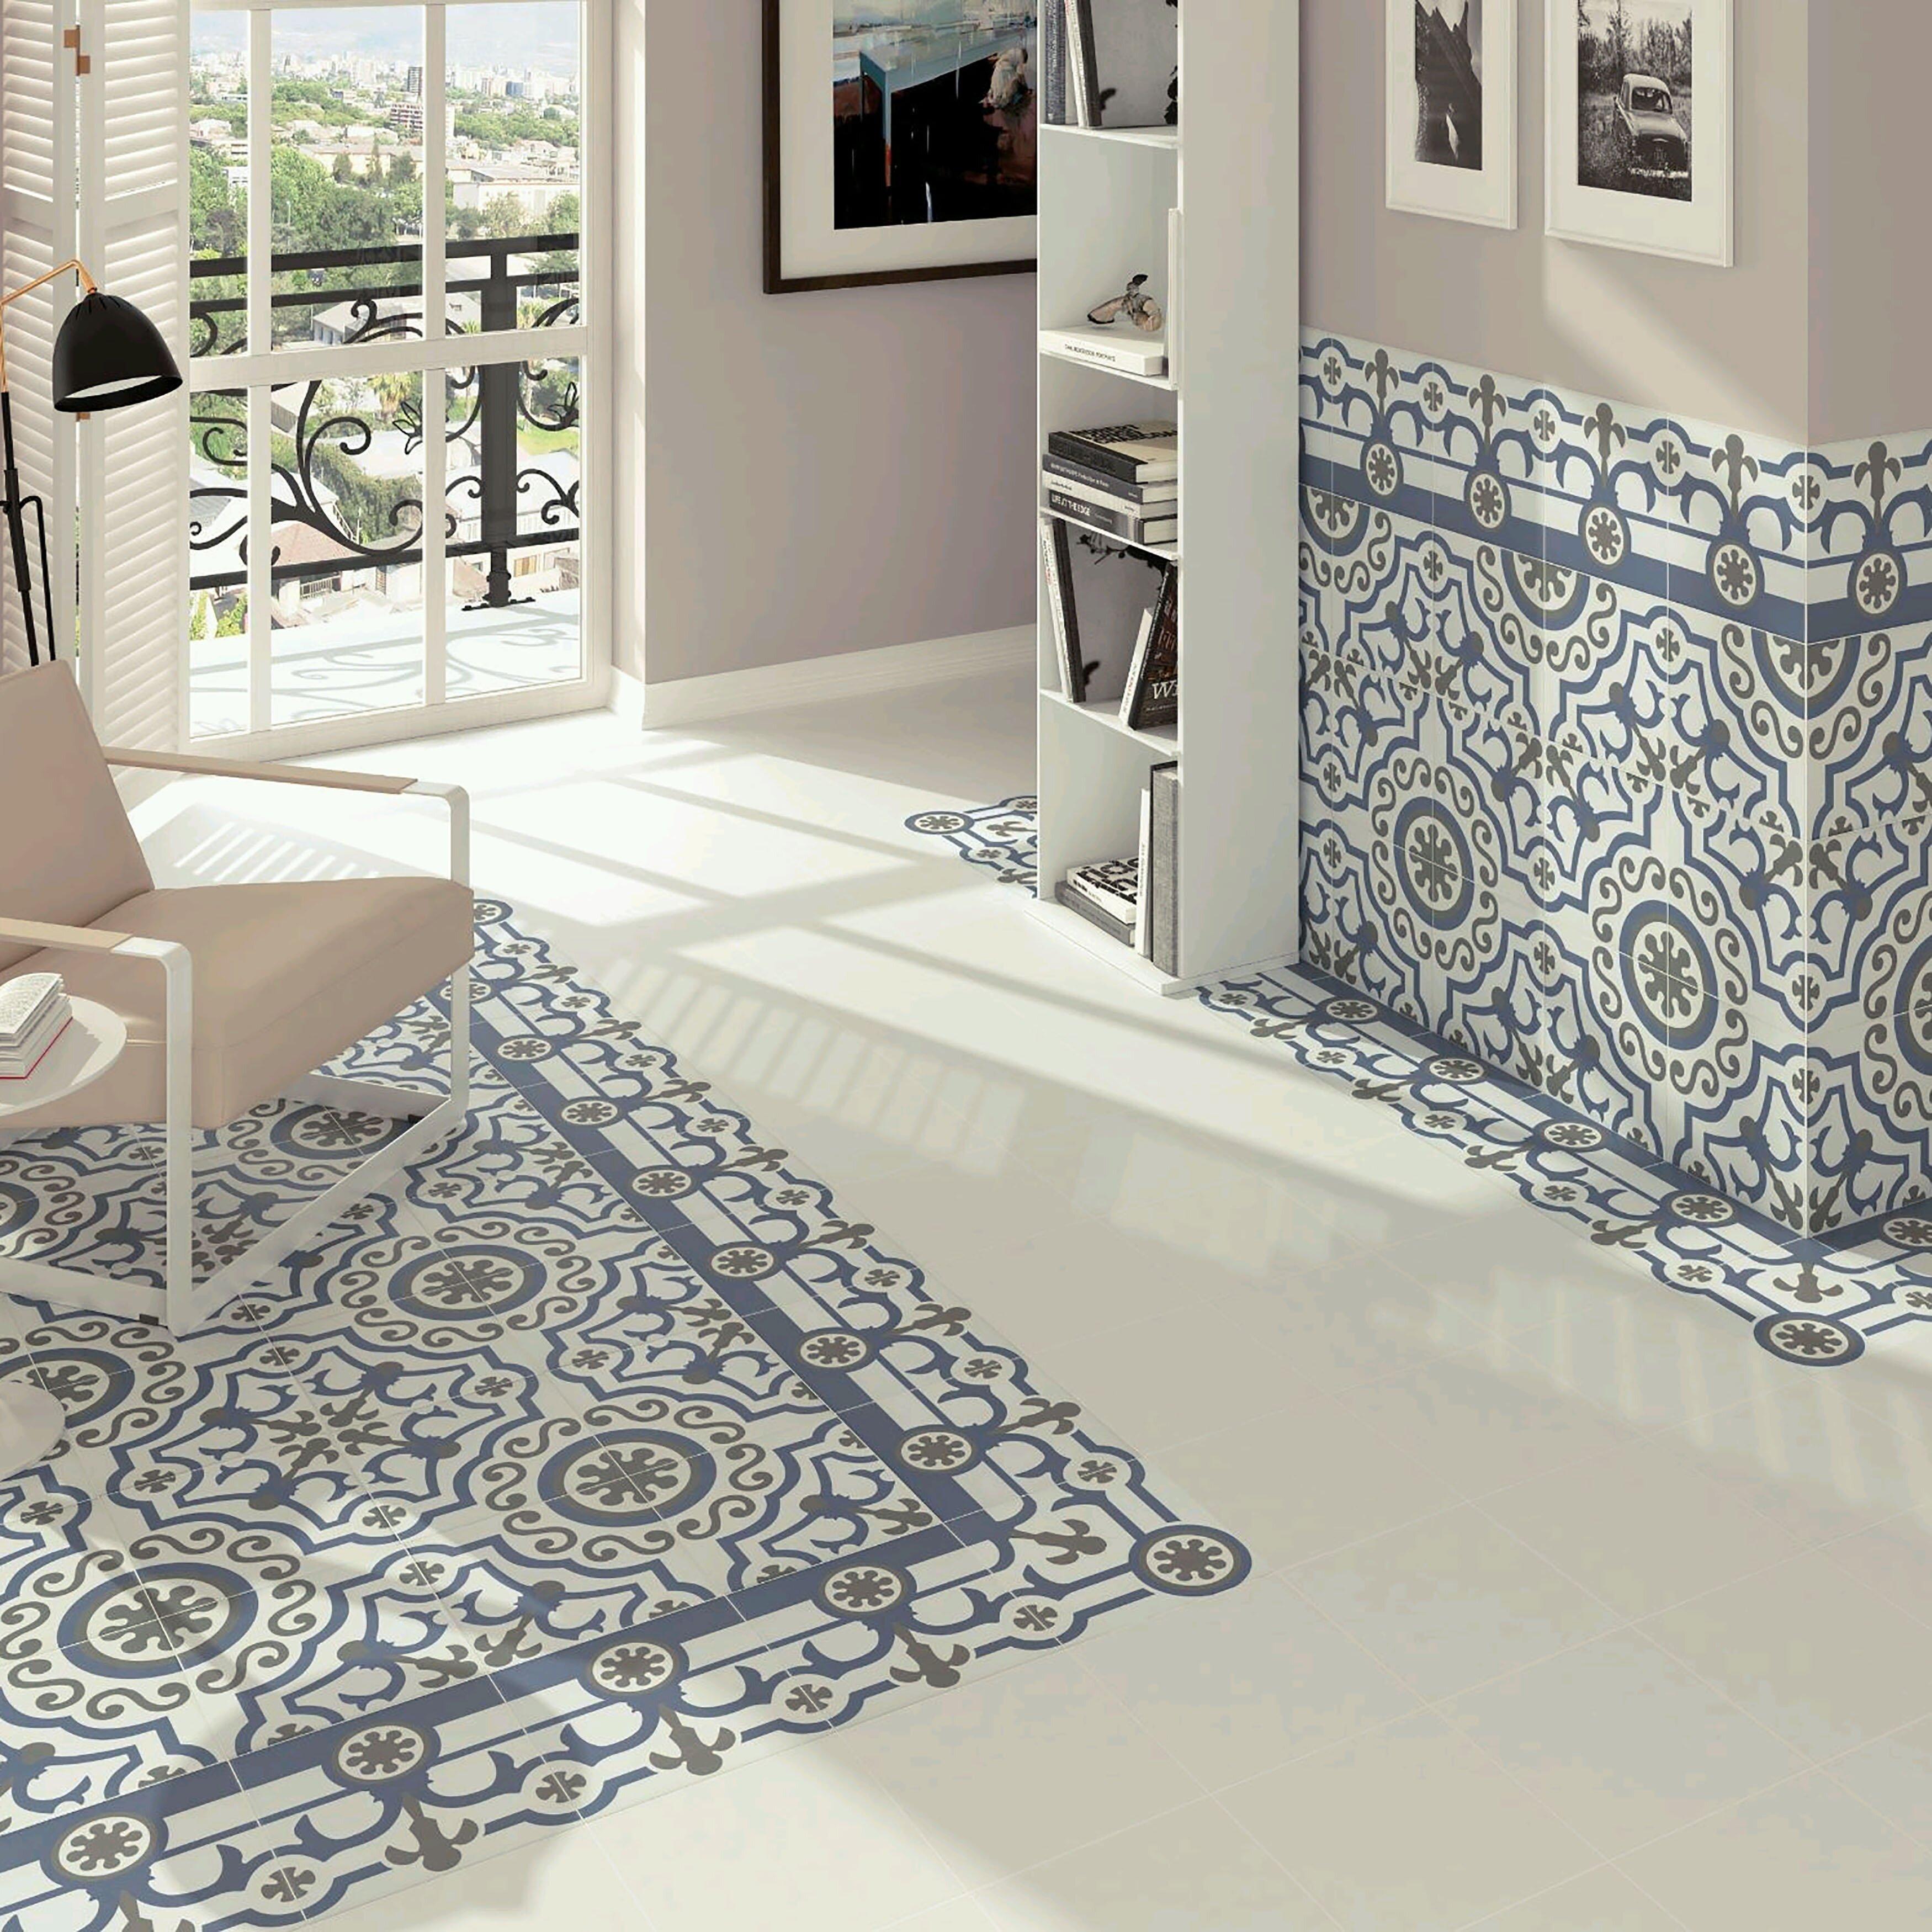 Elitetile hydraulic 9 5 x 9 5 porcelain floor and wall tile in ducados angulo reviews wayfair - Fliesen scheld ...